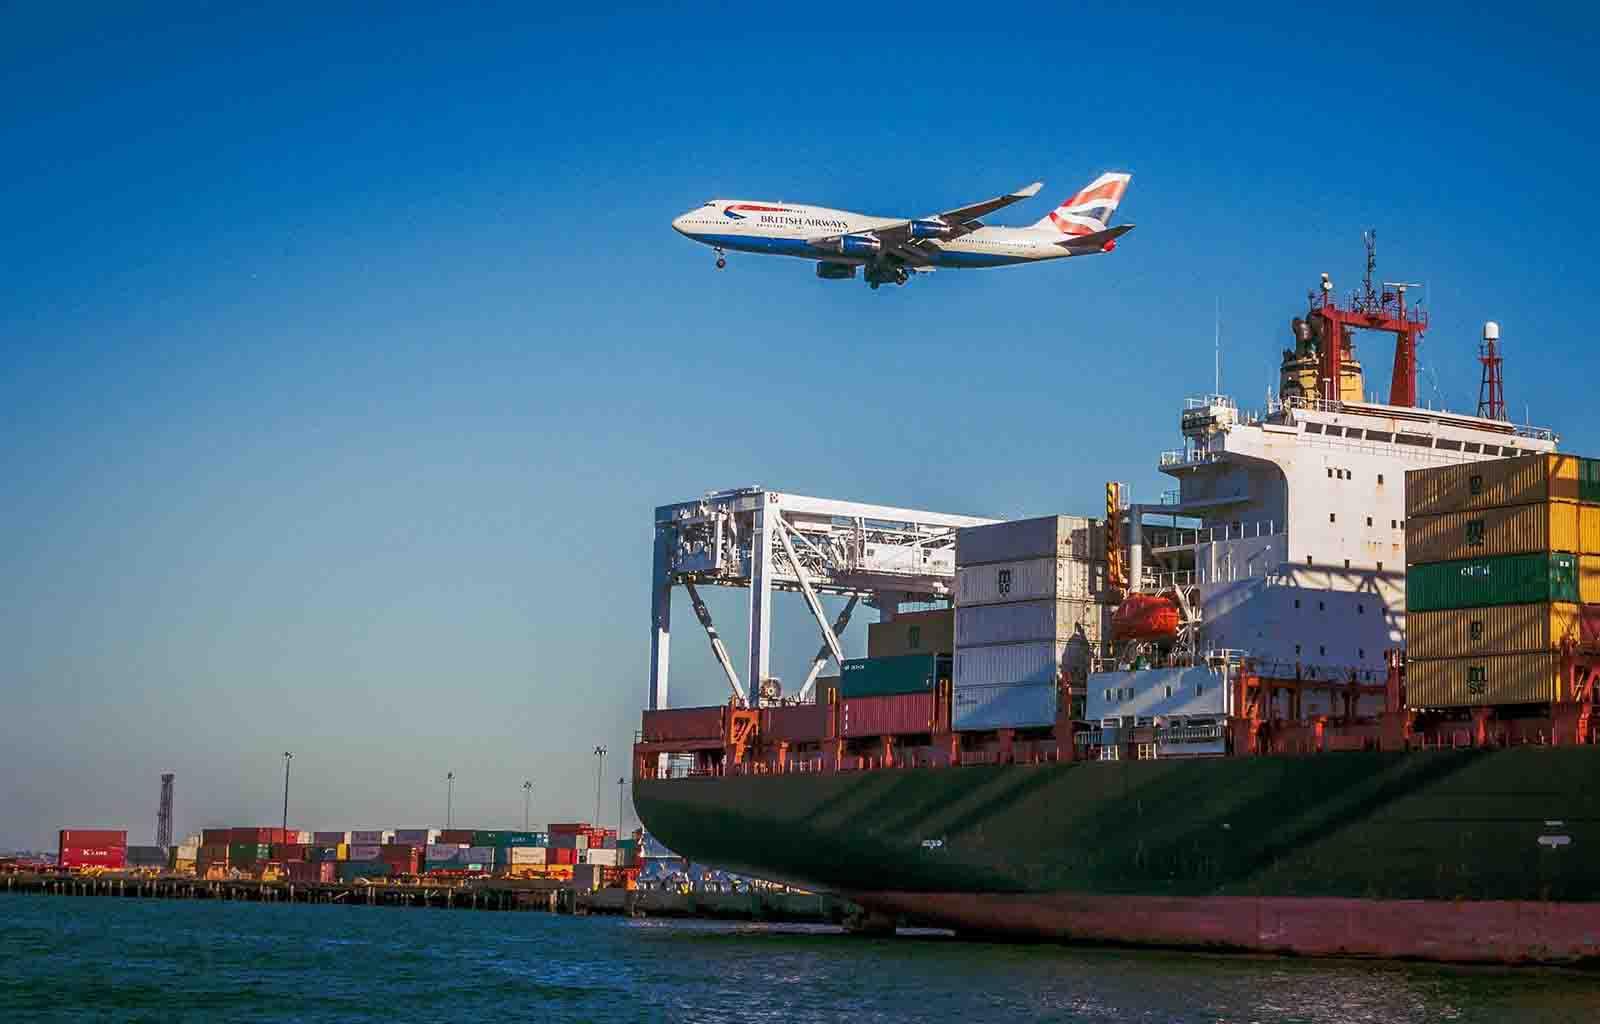 Ariplane and ship